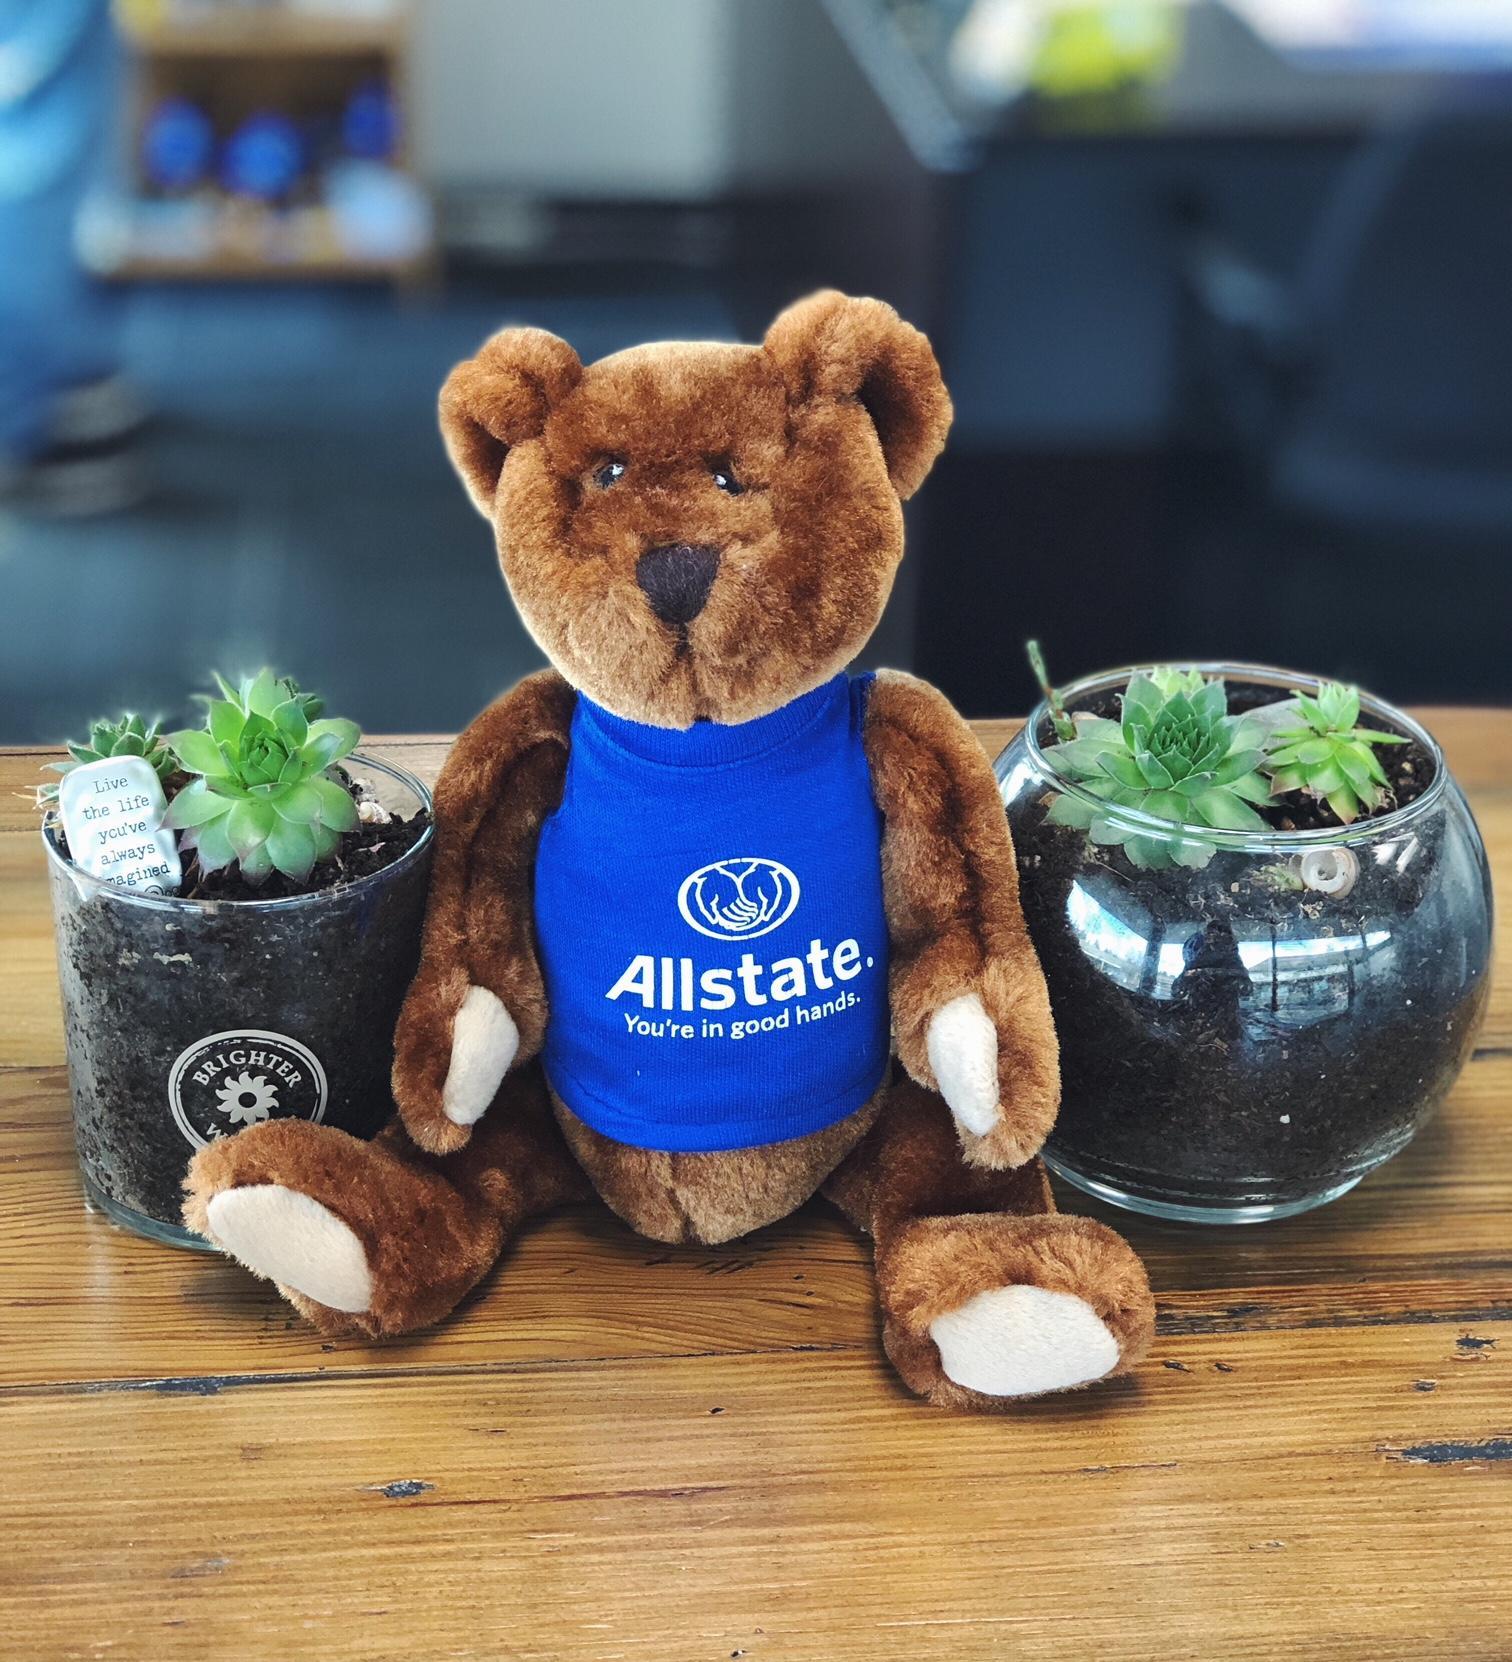 Kyle MacVicar: Allstate Insurance image 2